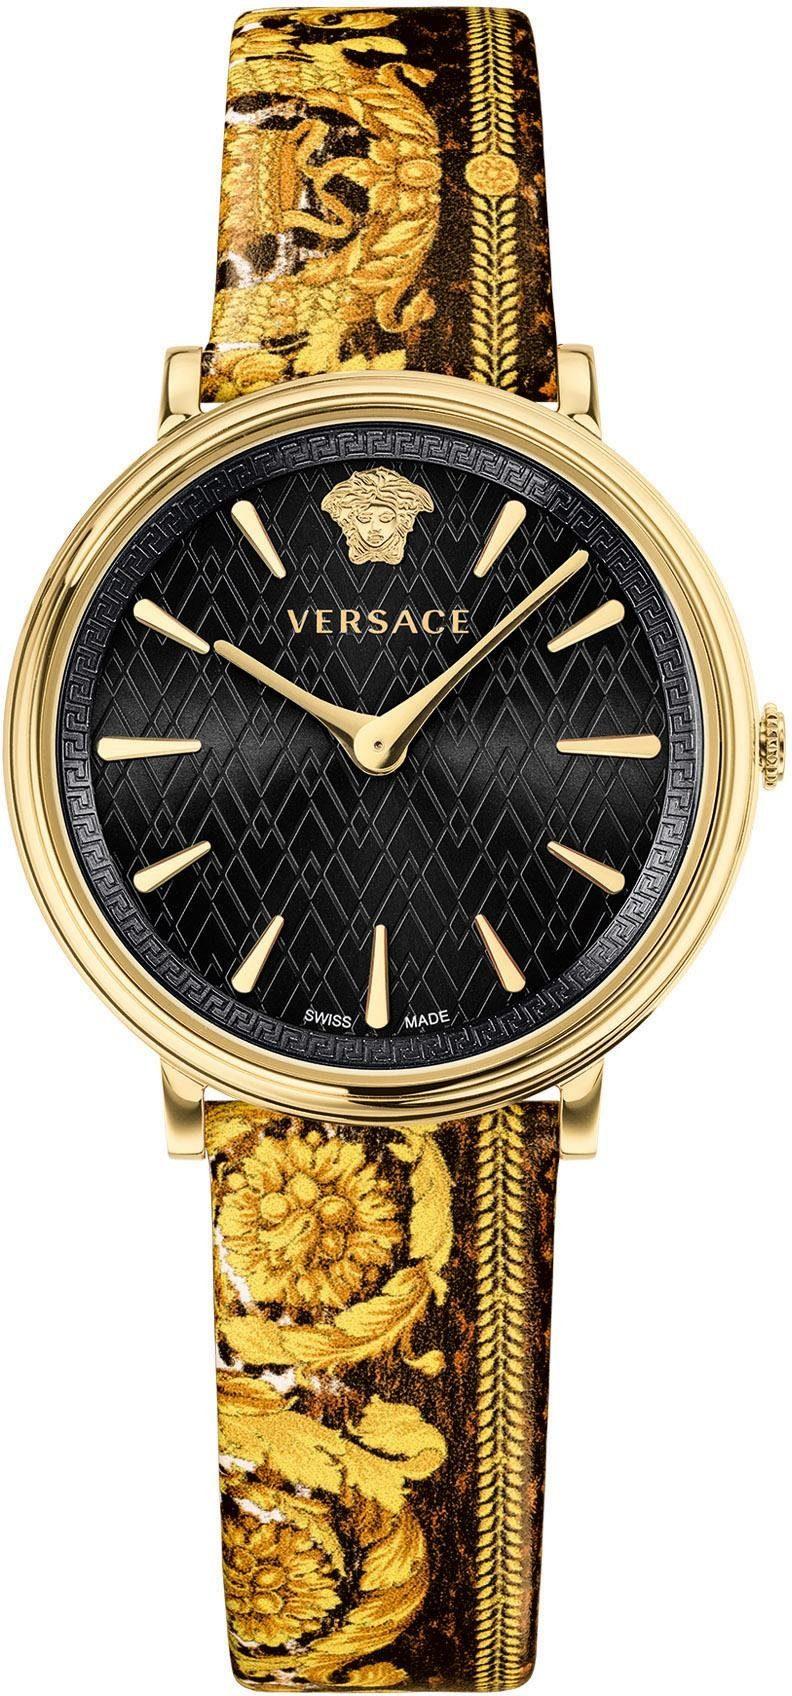 Versace Quarzuhr »V-Circle Tribute, VBP130017«